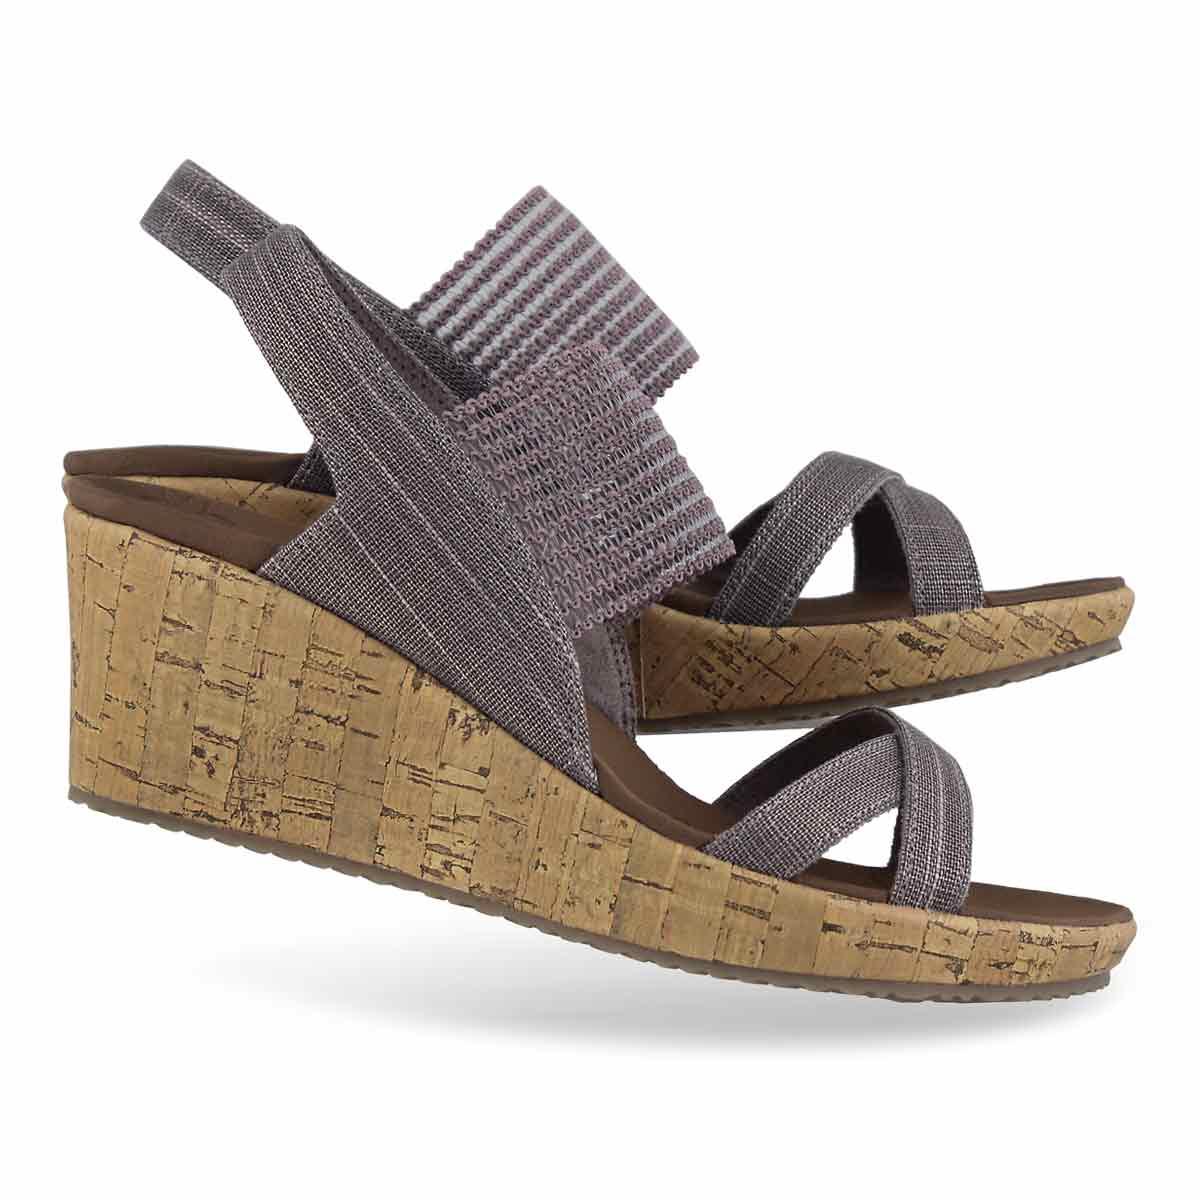 Women's BEVERLEE HIGH TEA mauve wedge sandals